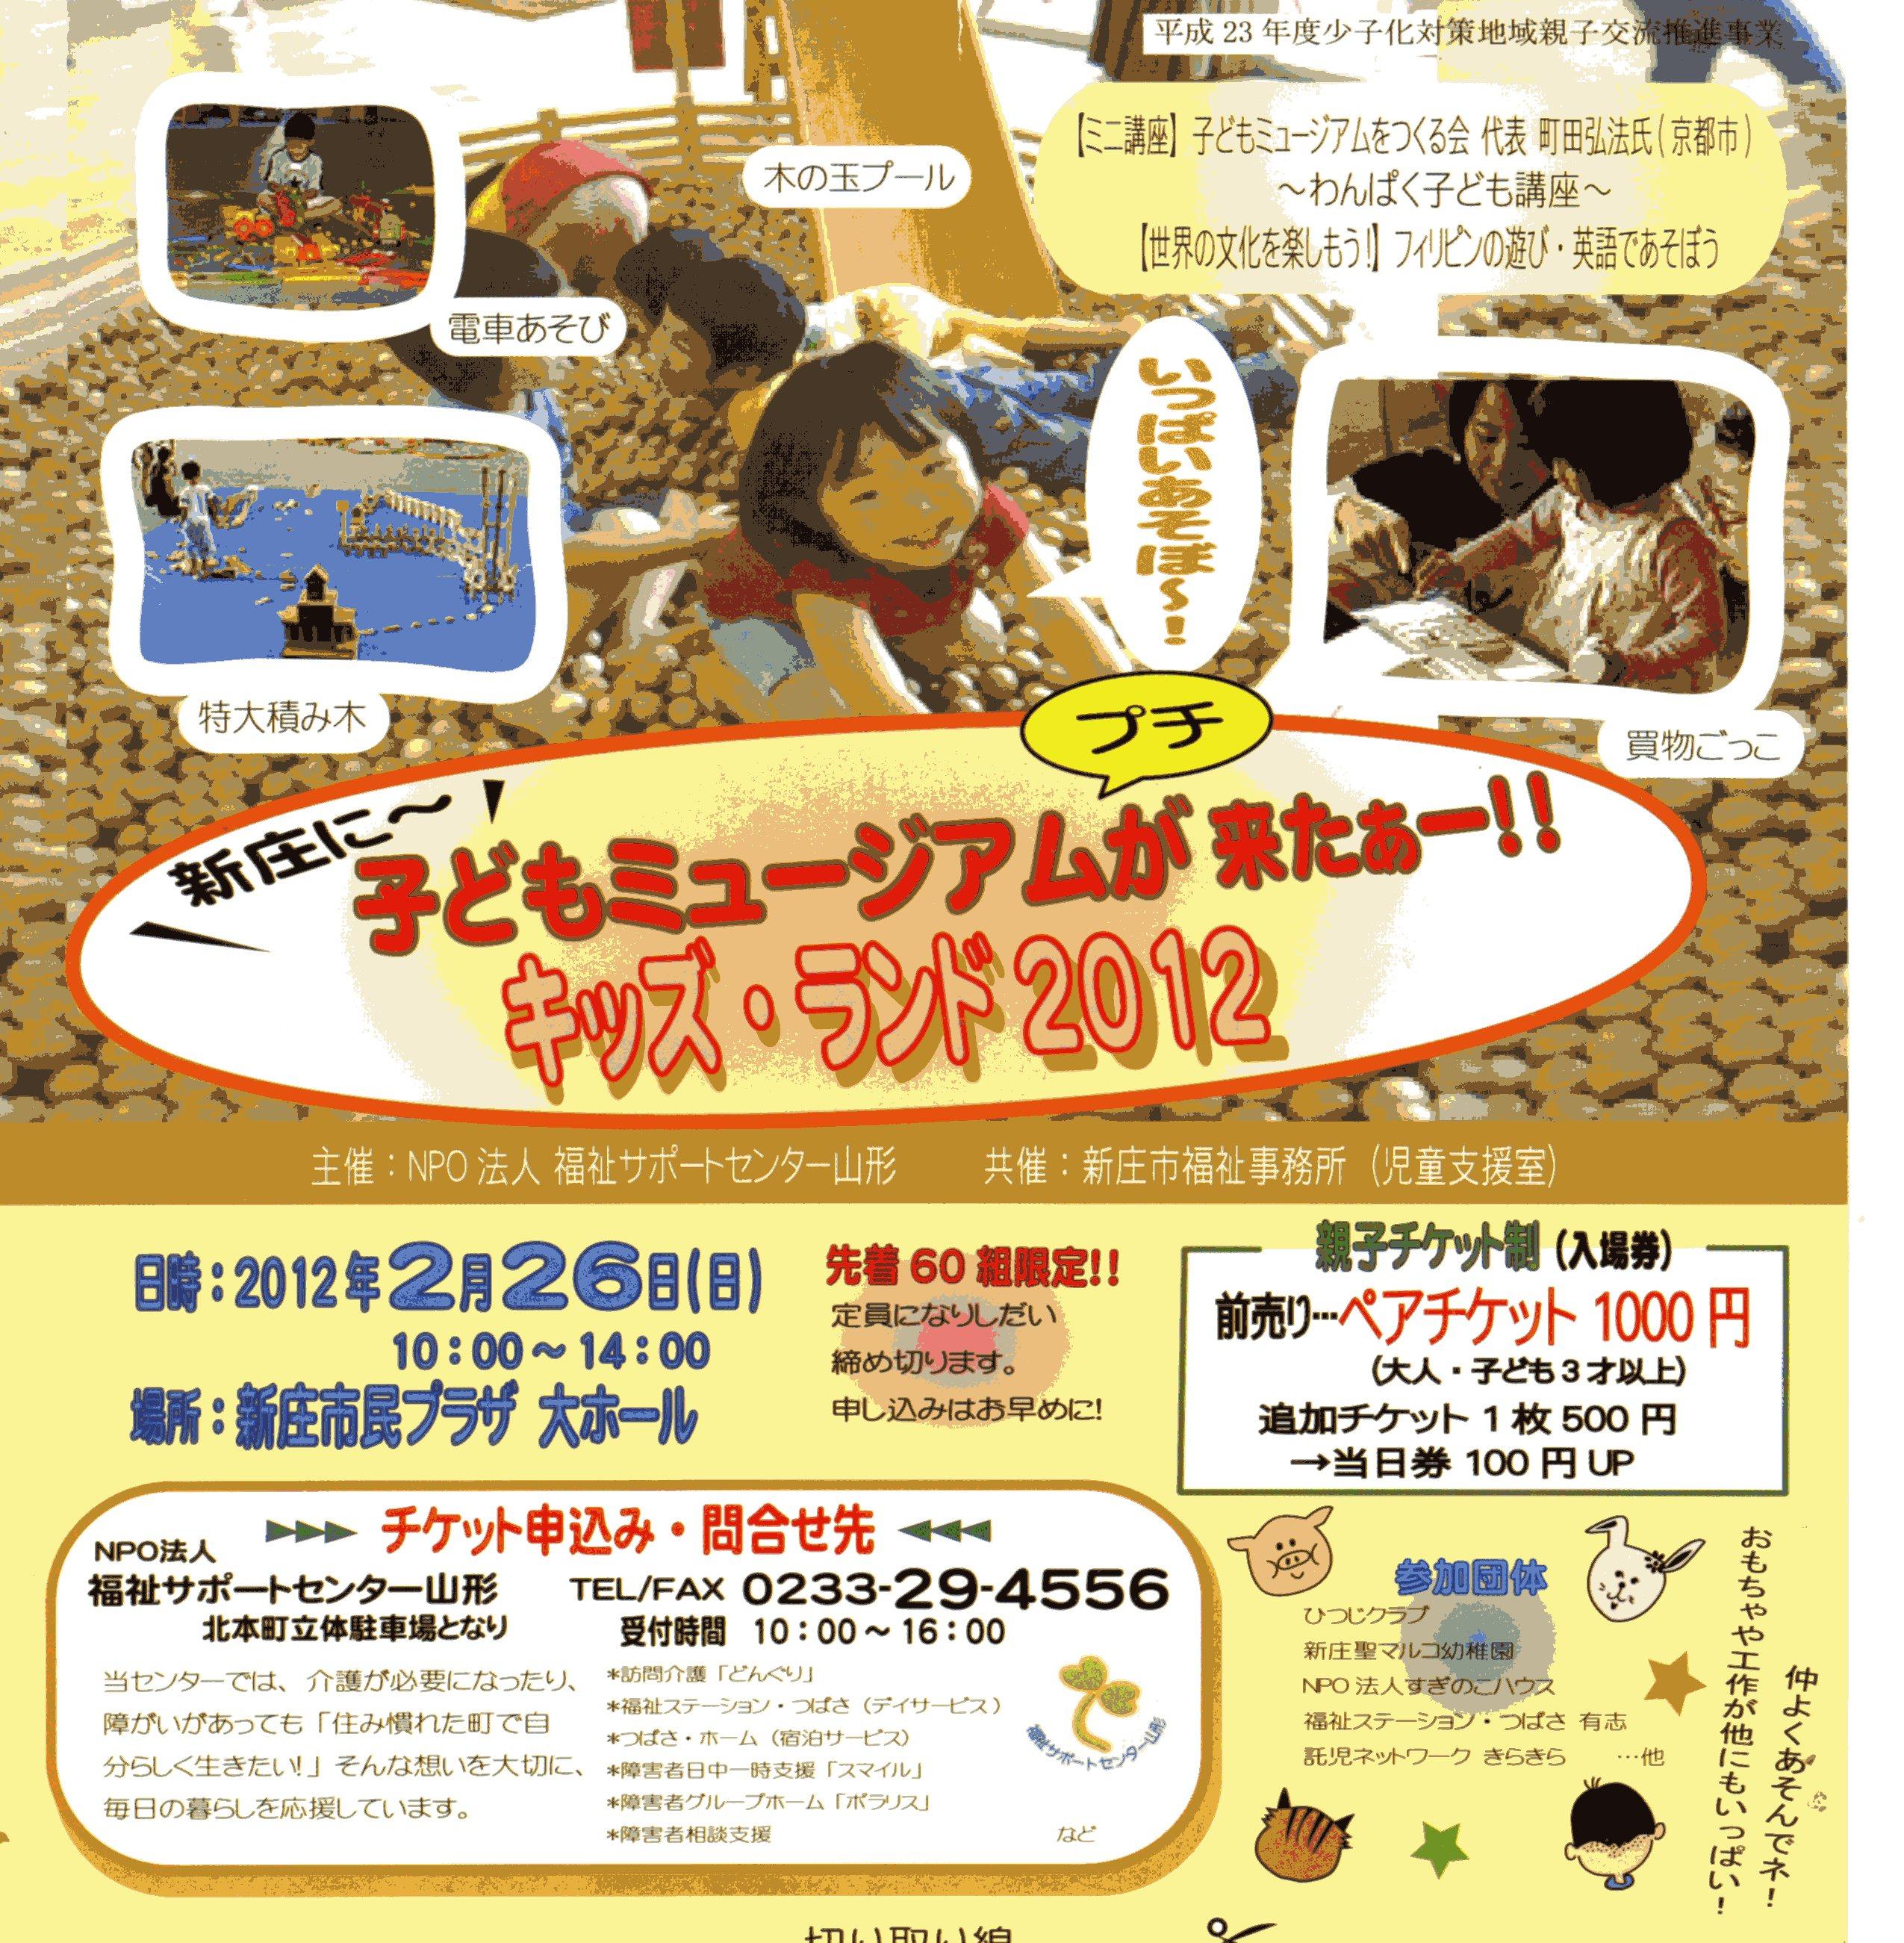 f:id:nagamimiya:20120216073509j:image:w640